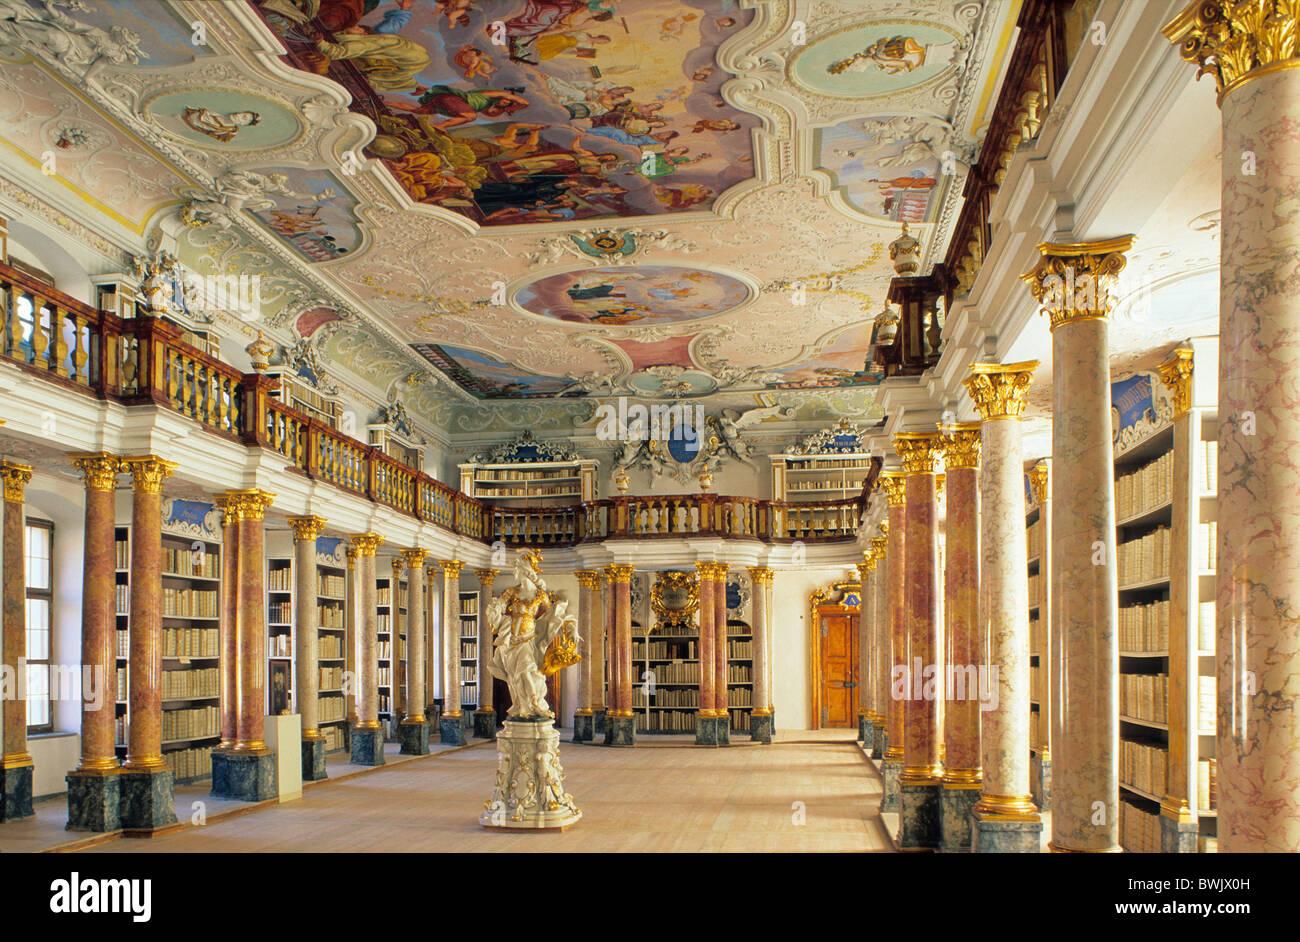 Europe, Germany, Bavaria, Ottobeuren, Ottobeuren Abbey Library - Stock Image